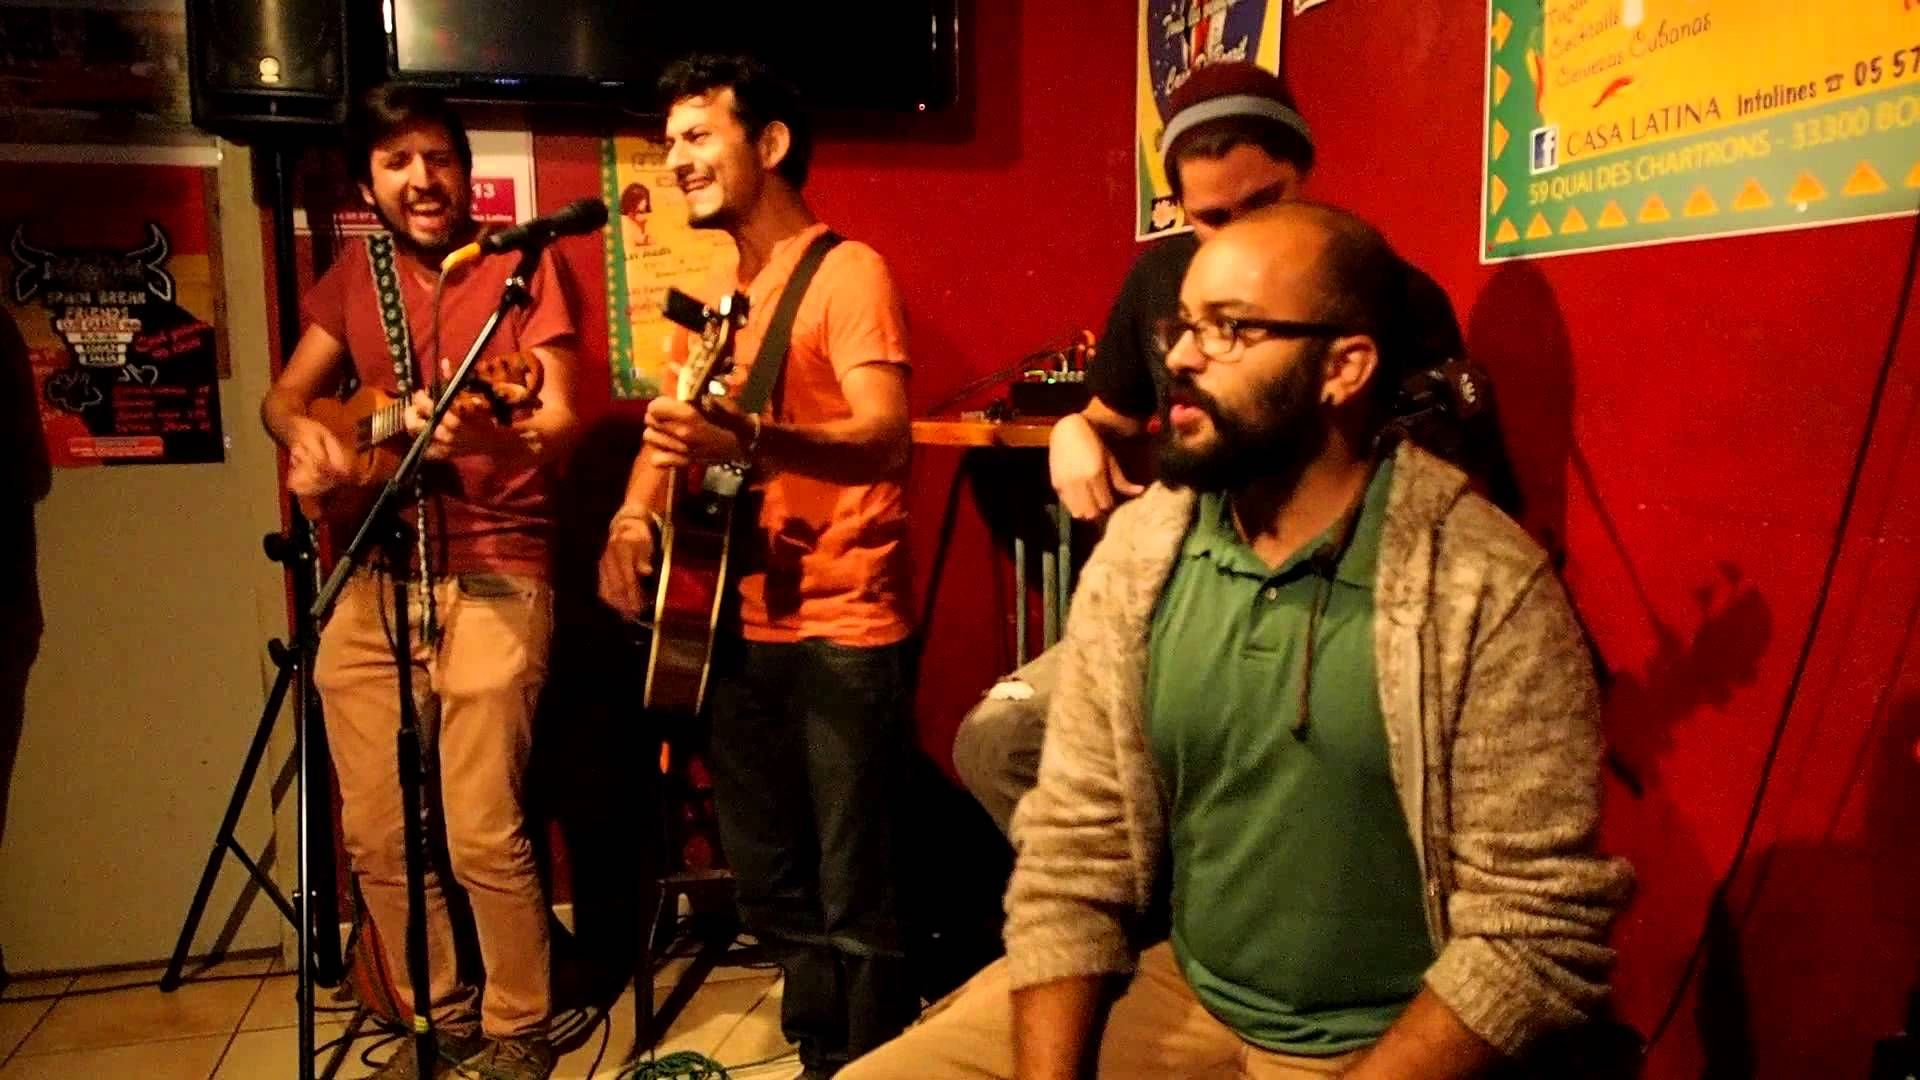 Tériso & Jano Arias cantan SPAIN BREAK FRIENDS CASA LATINA (Bordeaux 30-... TOUS LES MERCREDIS SPAIN BREAK FRIENDS (Rumba Reggae Salsa) TOUS LES JEUDIS OPEN ZIK LIVE (Concert divers) TOUS LES VENDREDI BRAZIL TIME (Samba Forro) TOUS LES SAMEDIS LATINO TIME (TAINOS & His Live Latino) TOUS LES DIMANCHES OPEN SUNDAY MUSIK (Live Accoustik  CASA LATINA 59 QUAI DES CHARTRONS 33300 BORDEAUX Infolines / 0557871580  CASA LATINA Tous les soirs concert.  https://www.youtube.com/watch?v=PGt1tsVrXG8